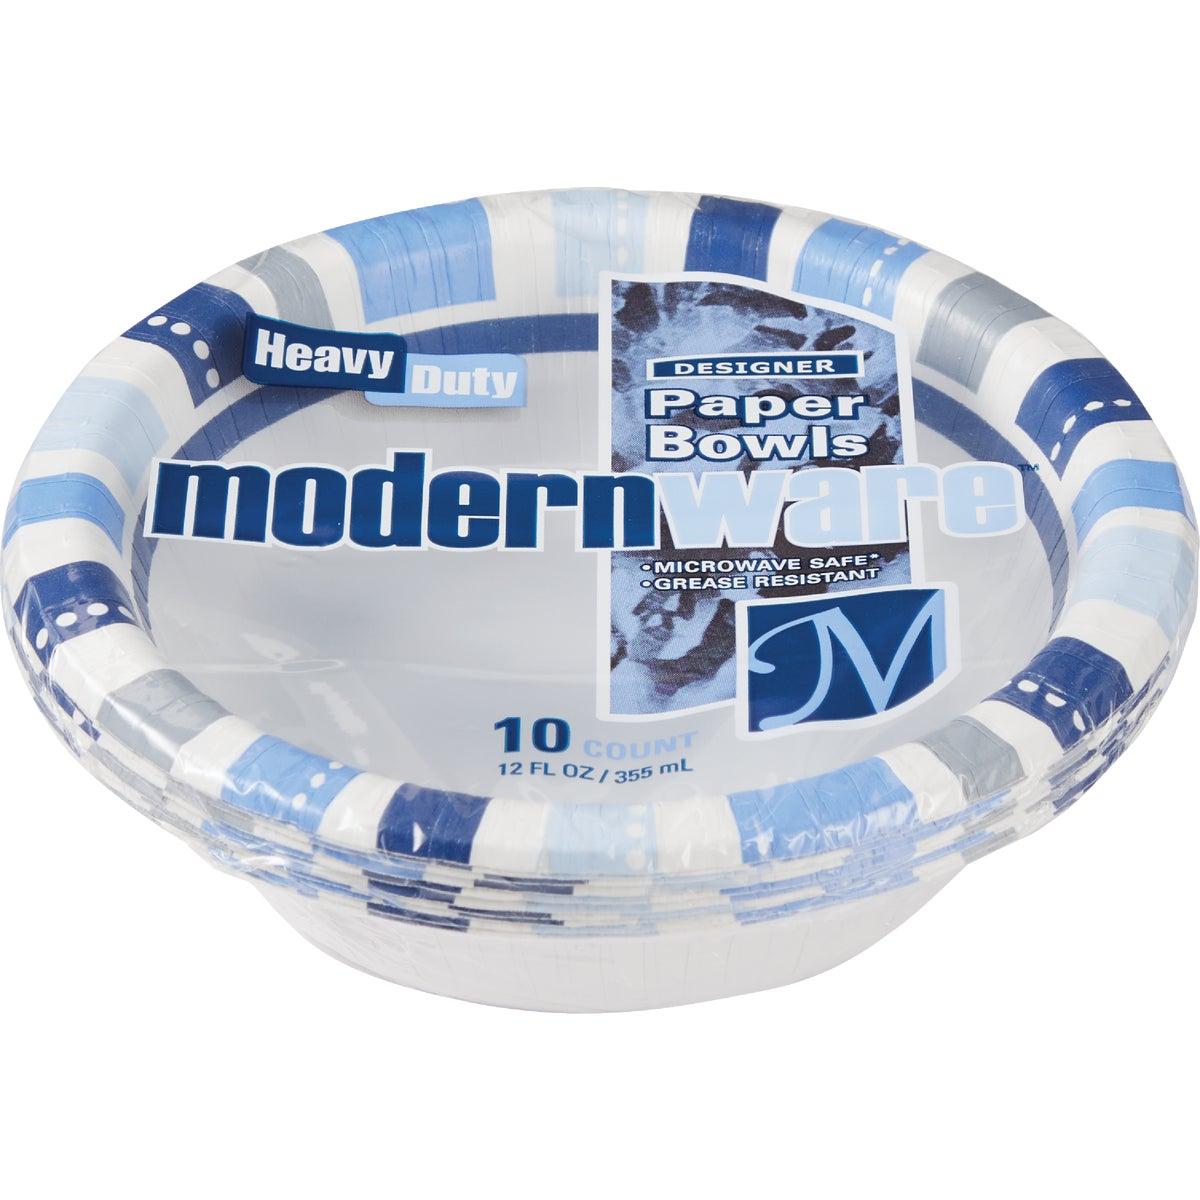 12CT 12OZ PAPER BOWL - DB6MWCEGI by A J M Packaging Corp